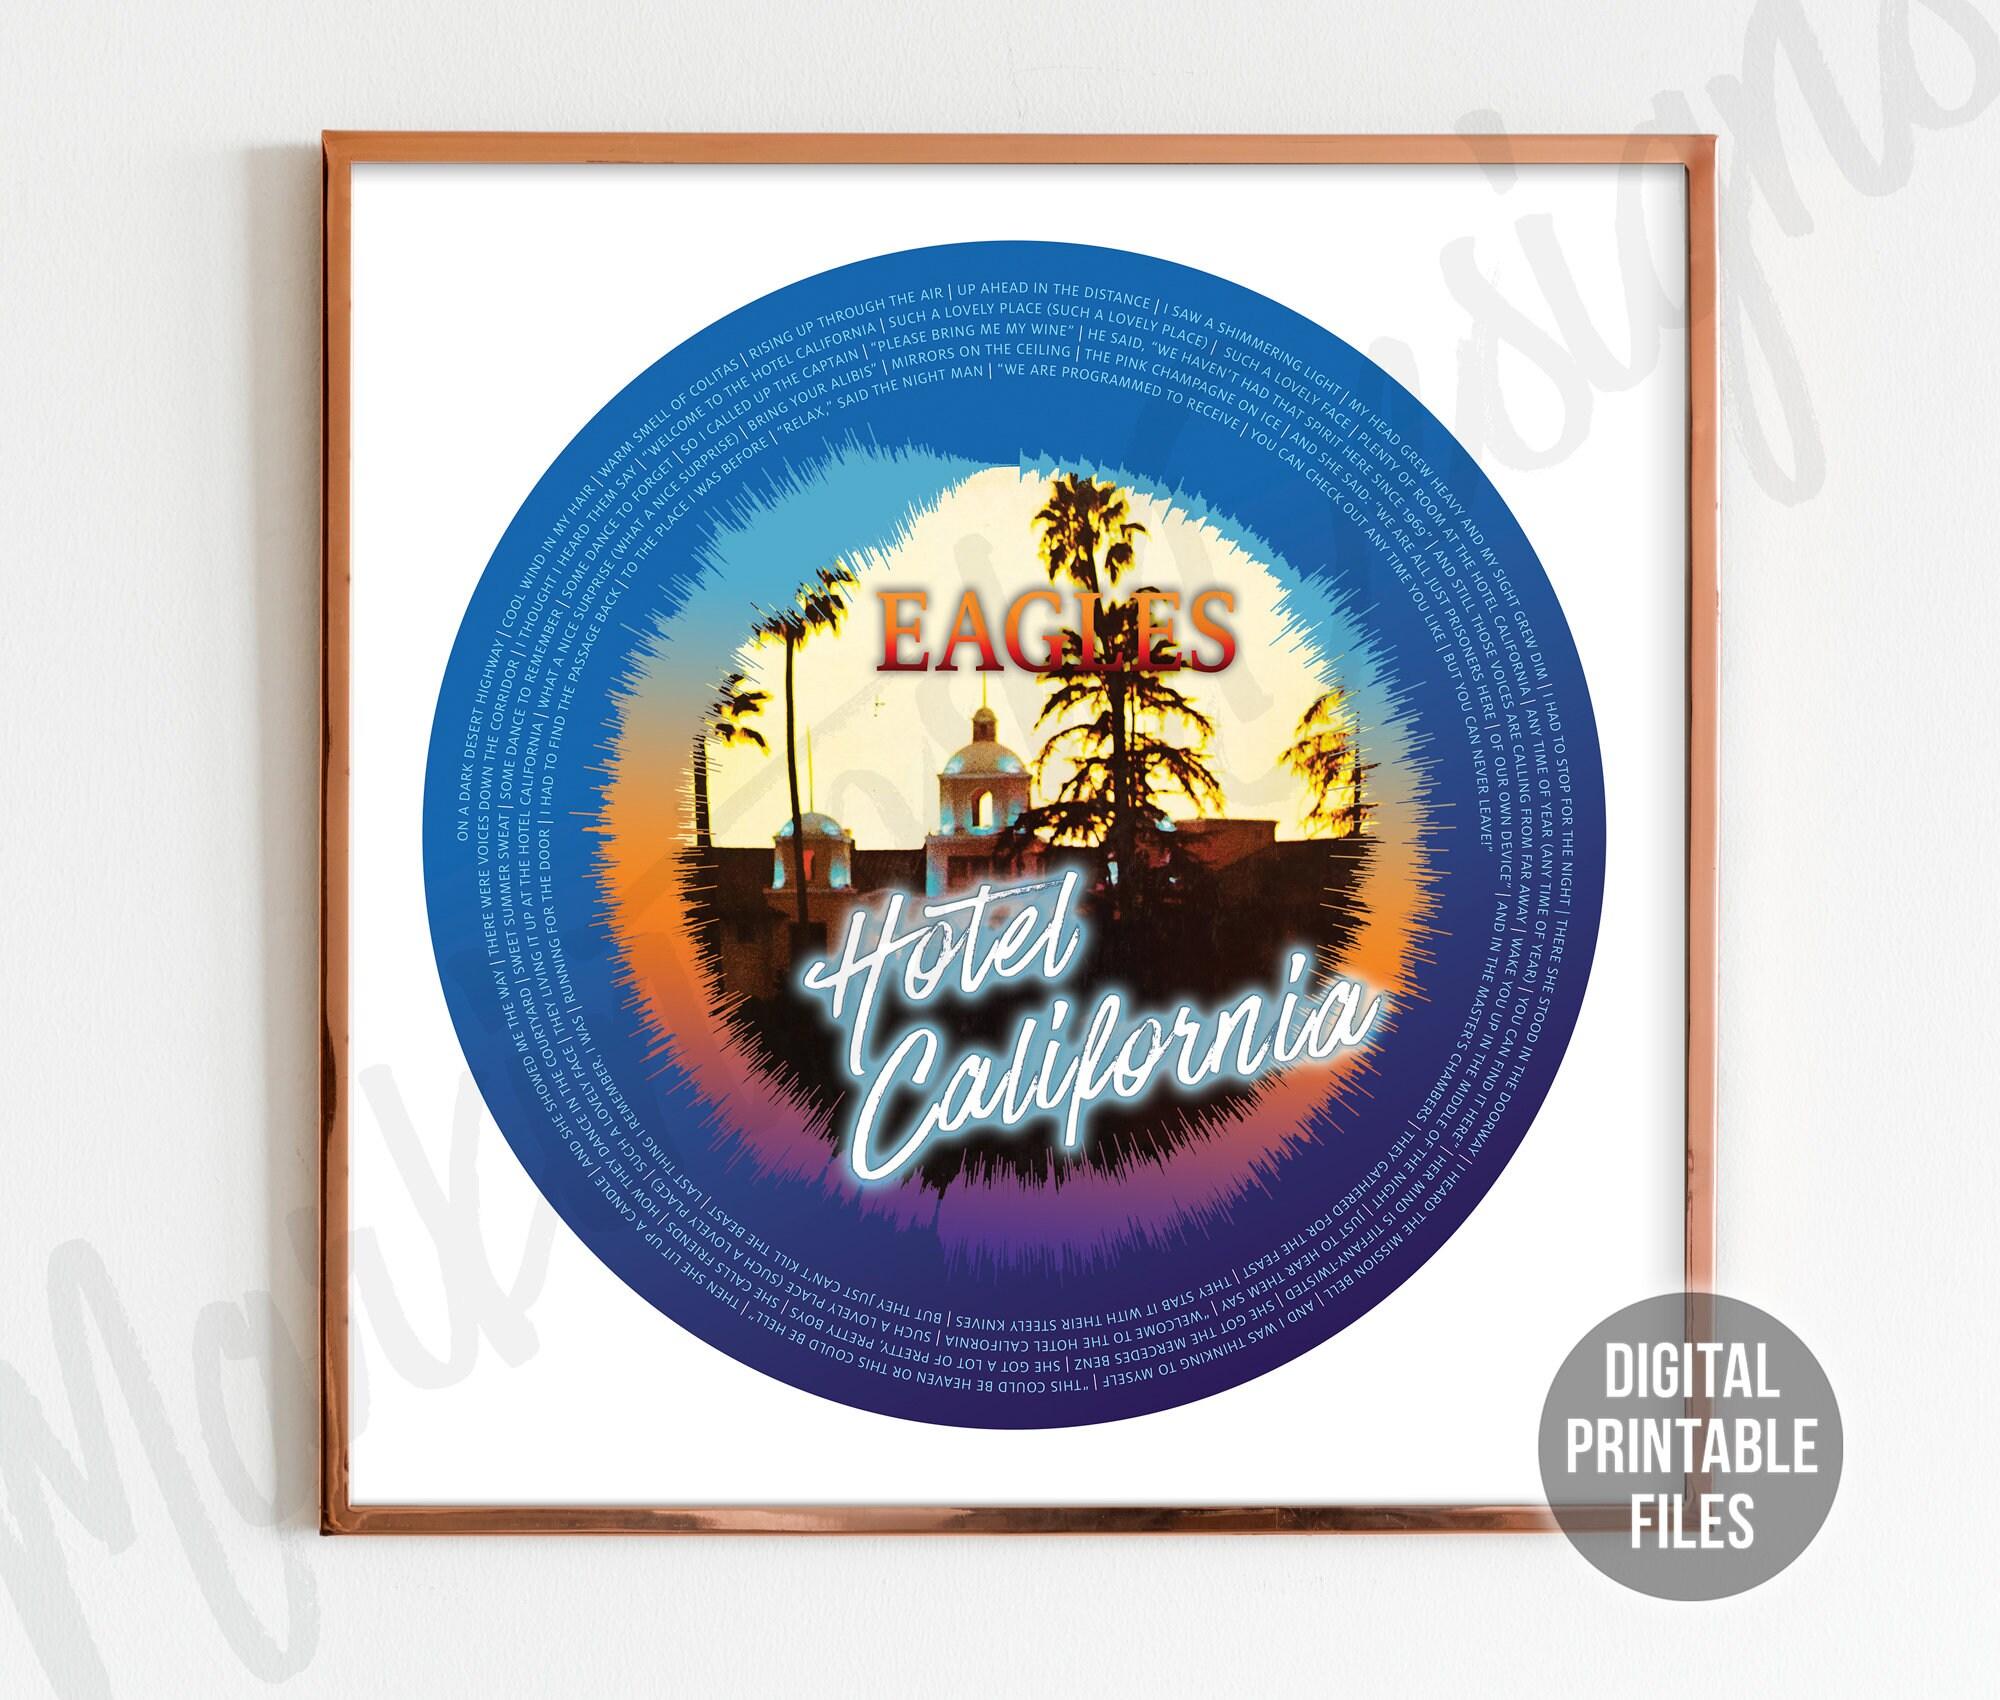 Hotel California, Soundwave and lyrics poster, Custom Printable digital  files